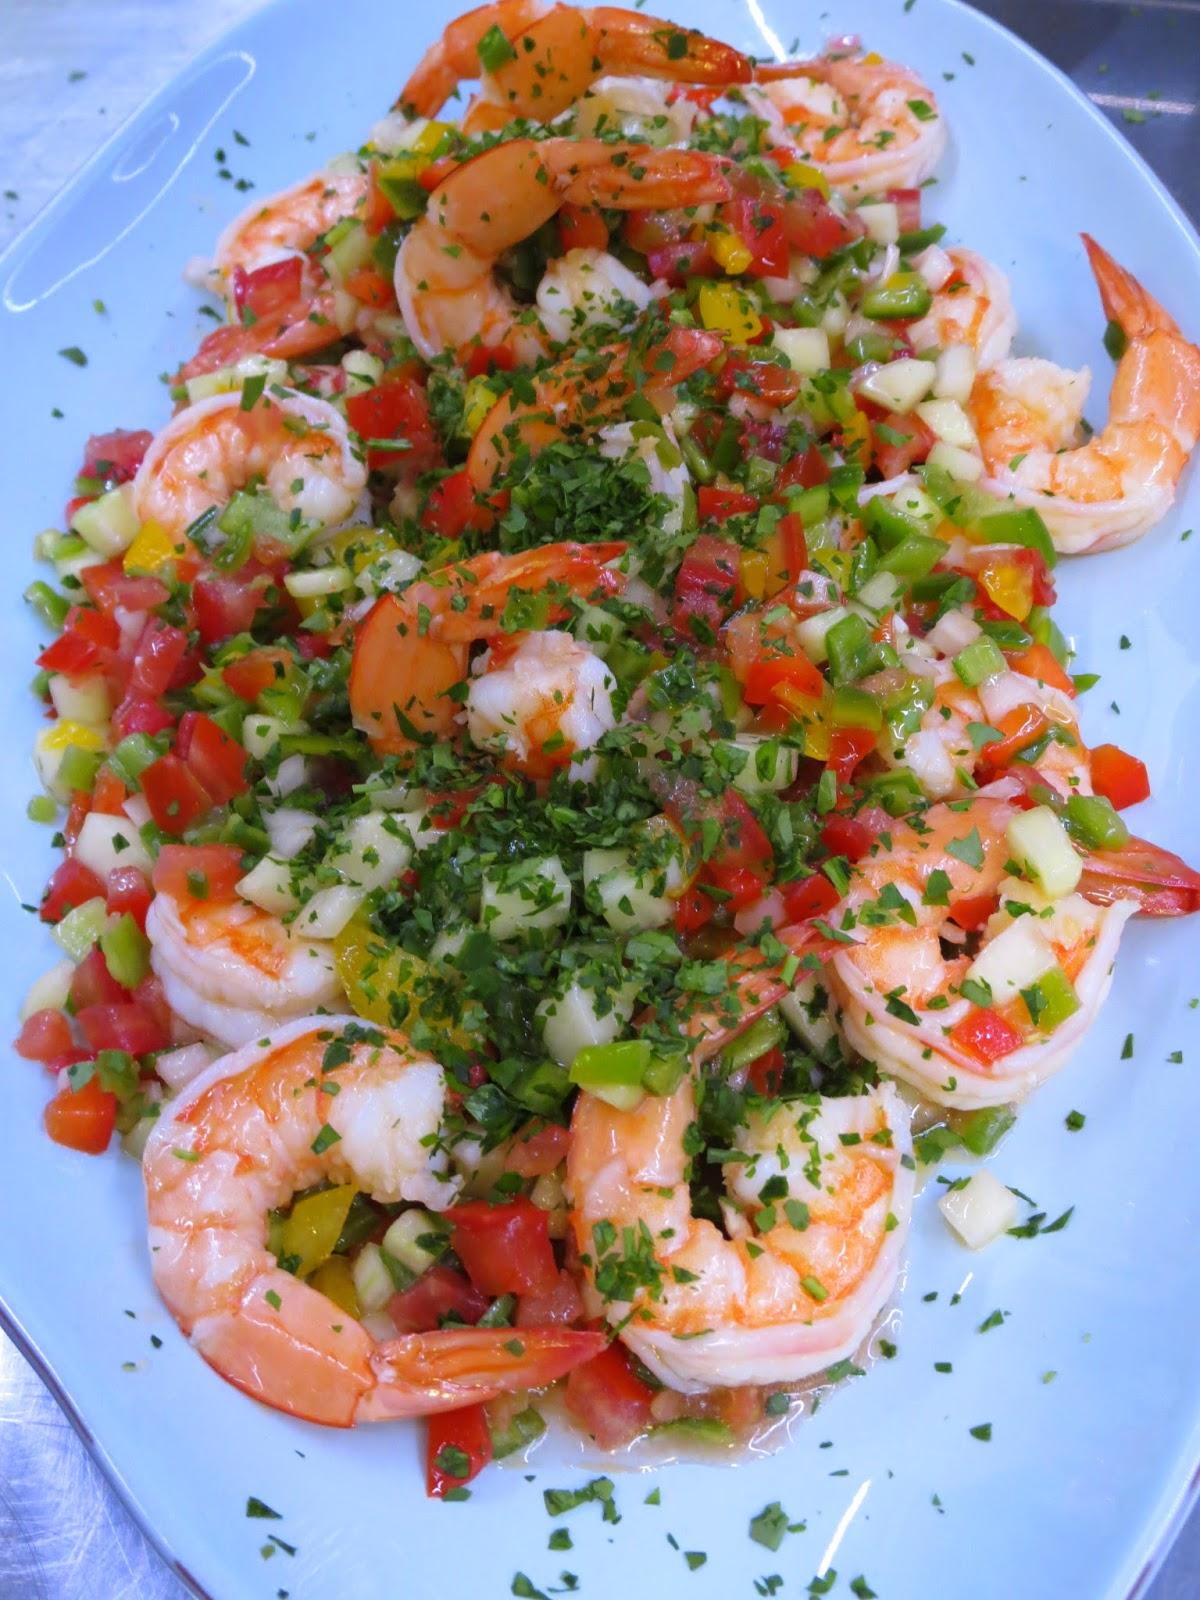 Chef silvano ilardo corso di cucina spagnola for Cucina spagnola